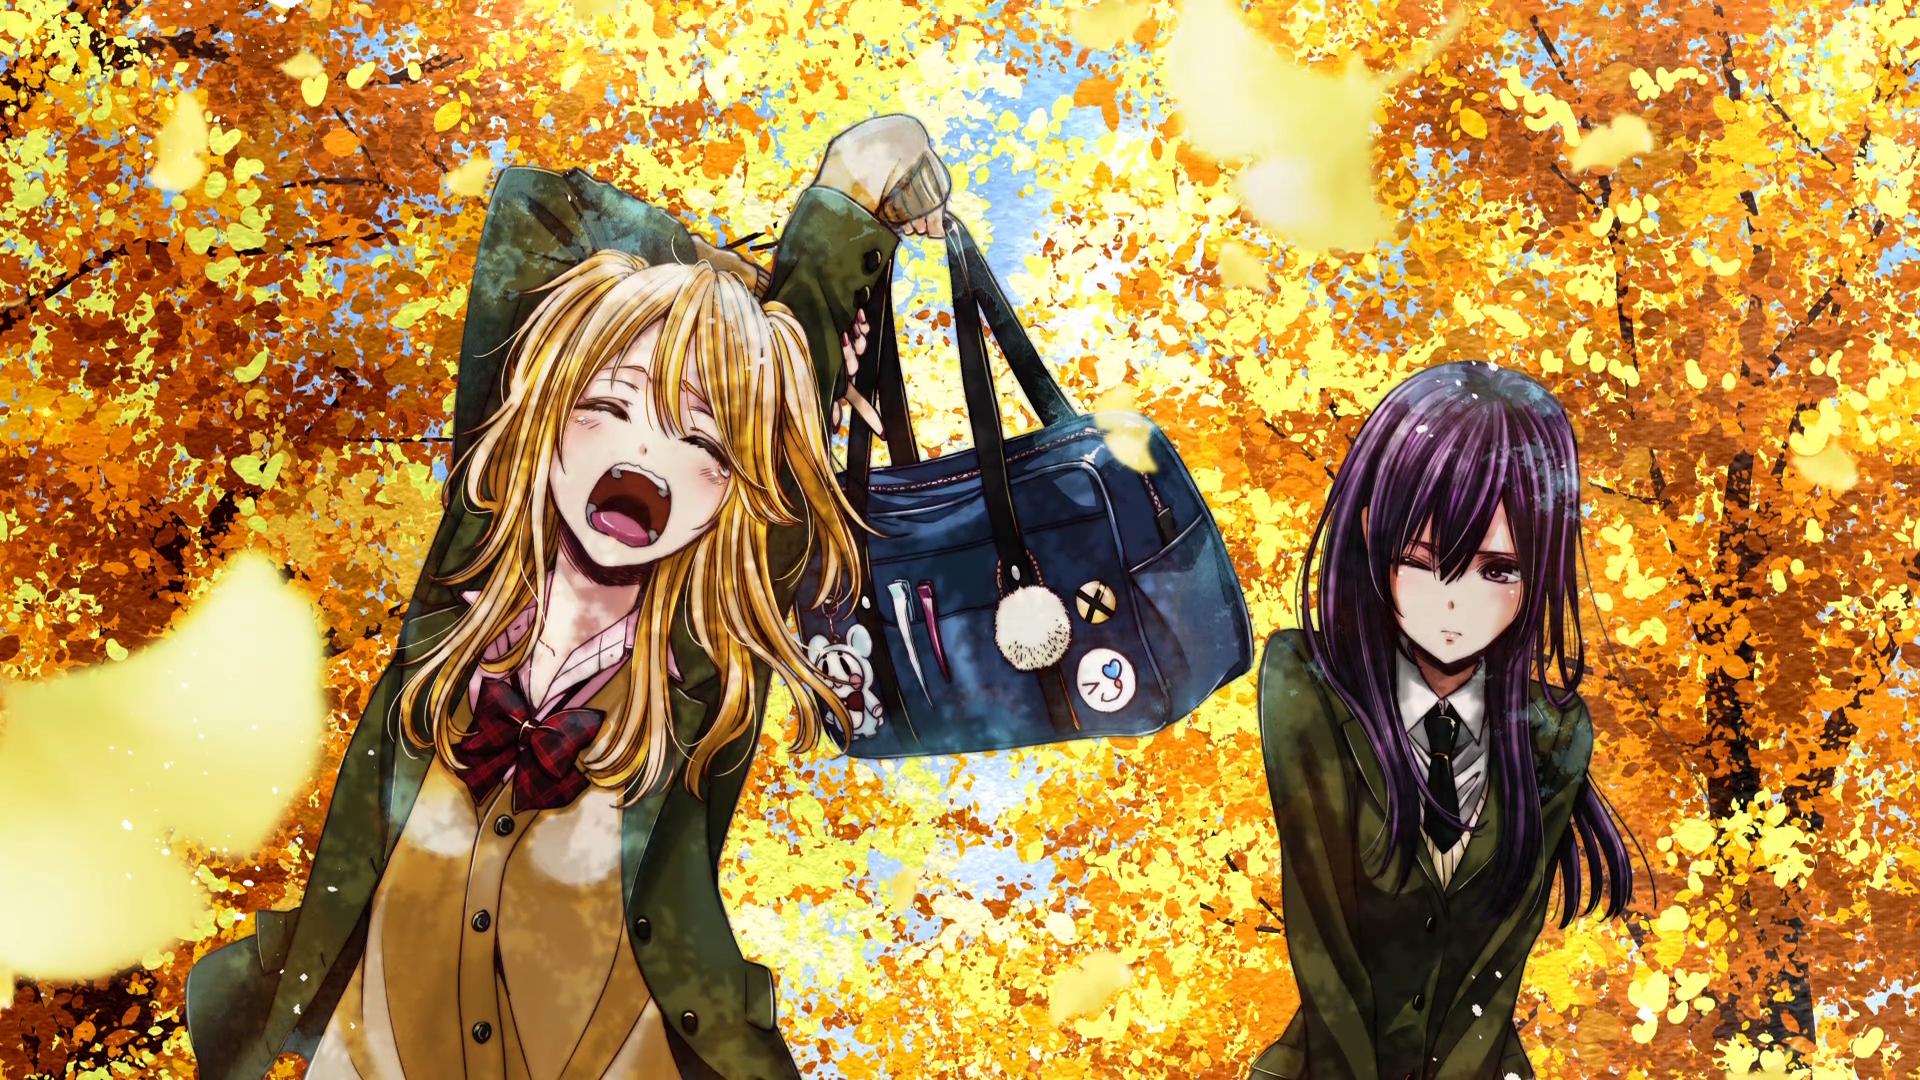 Anime Citrus Mei Aihara Yuzu Aihara Citrus (Anime) Long